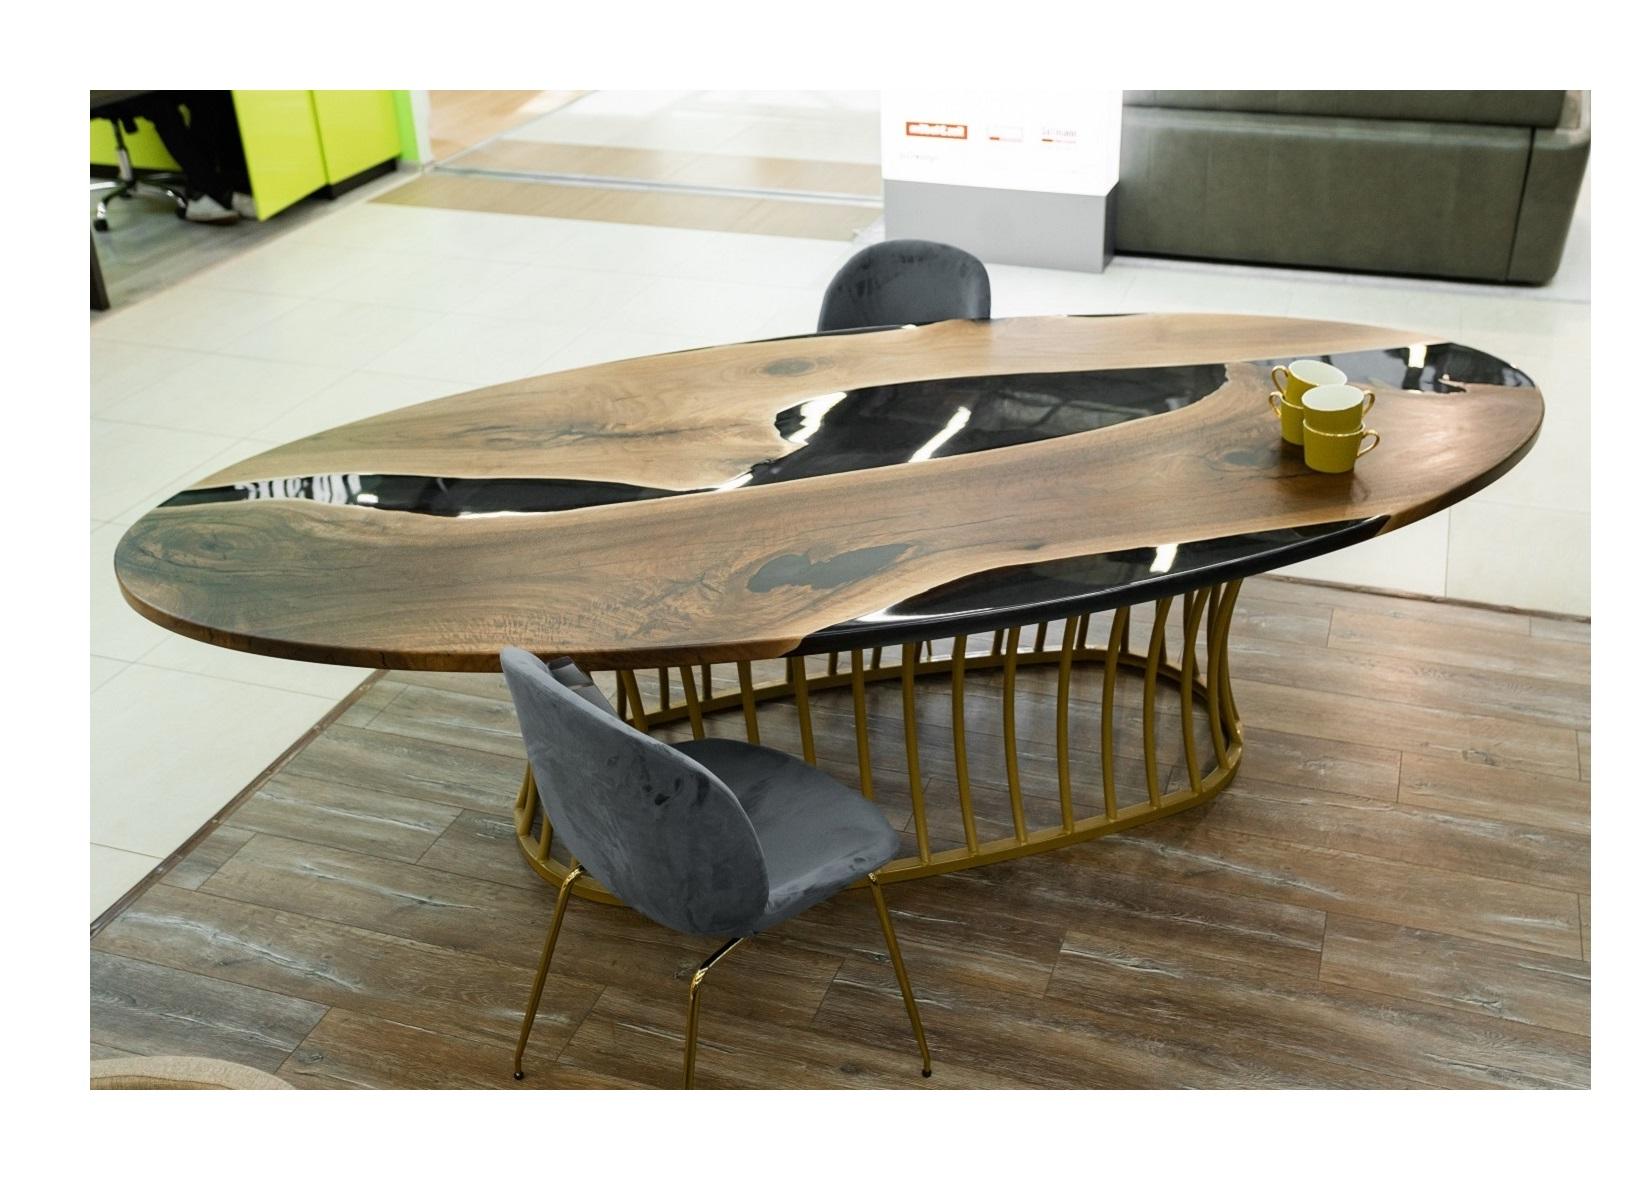 Обеденный стол (woodzpro) коричневый 140x75x280 см.